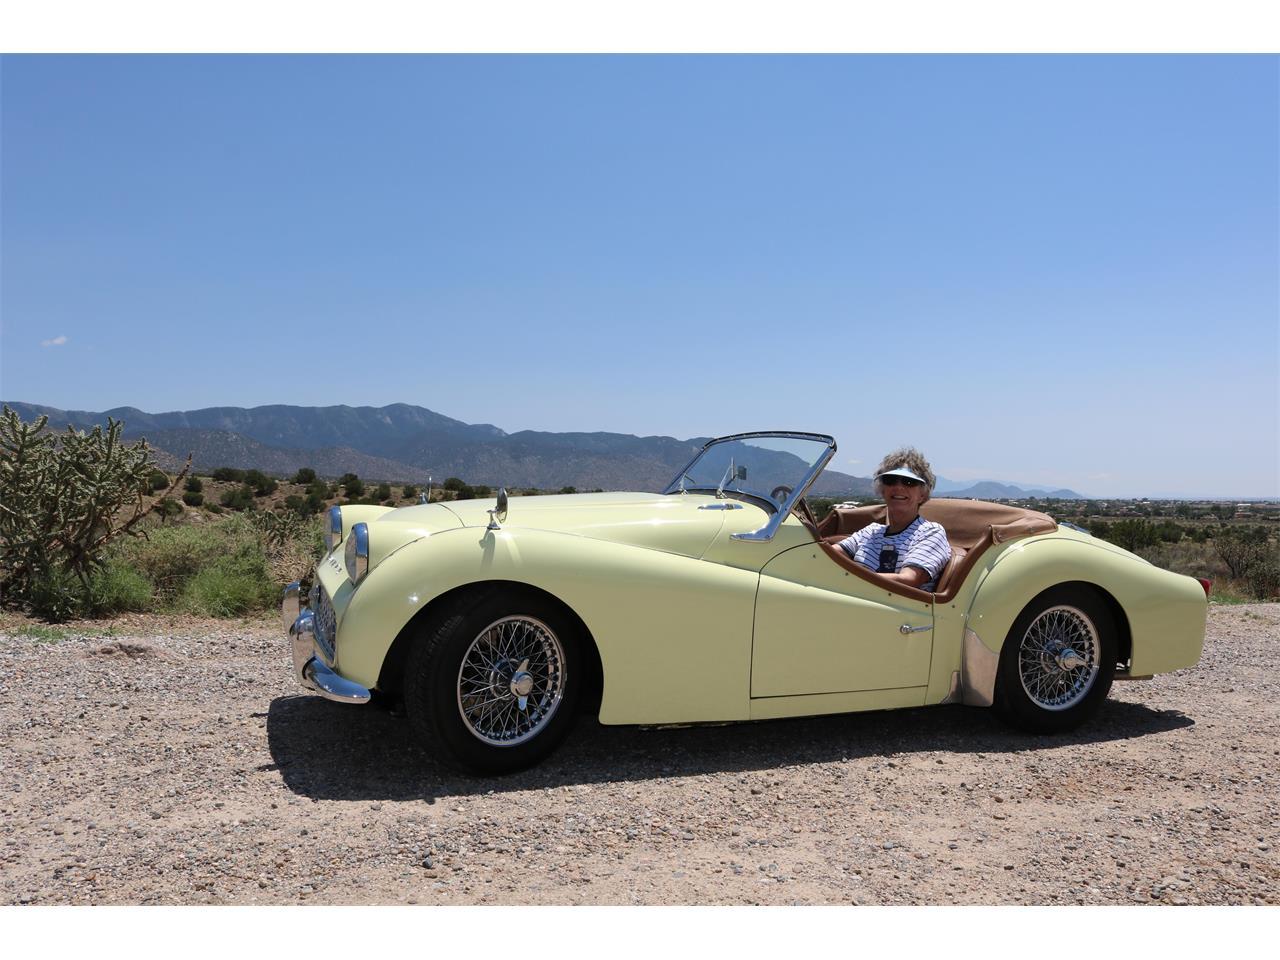 1961 Triumph Tr3a For Sale Classiccarscom Cc 1142737